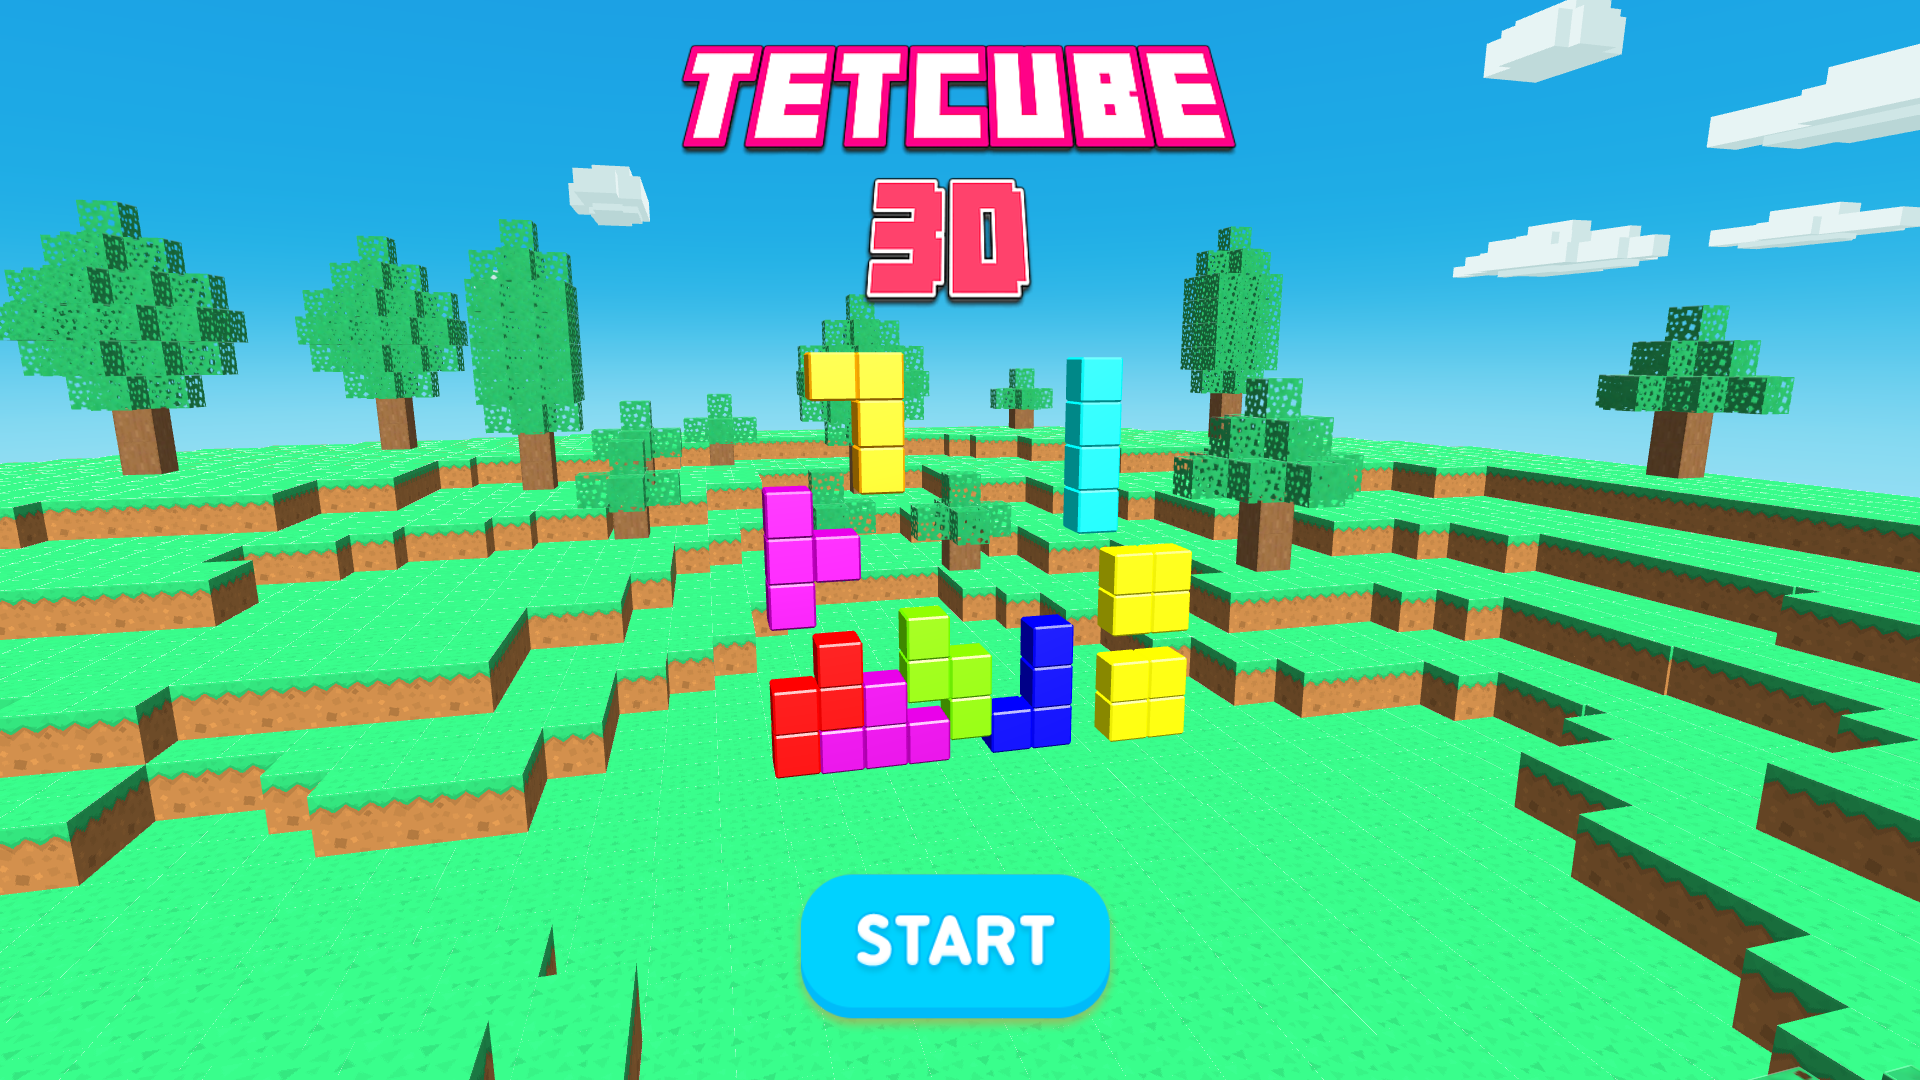 TETCUBE 3D for TV screenshot 2